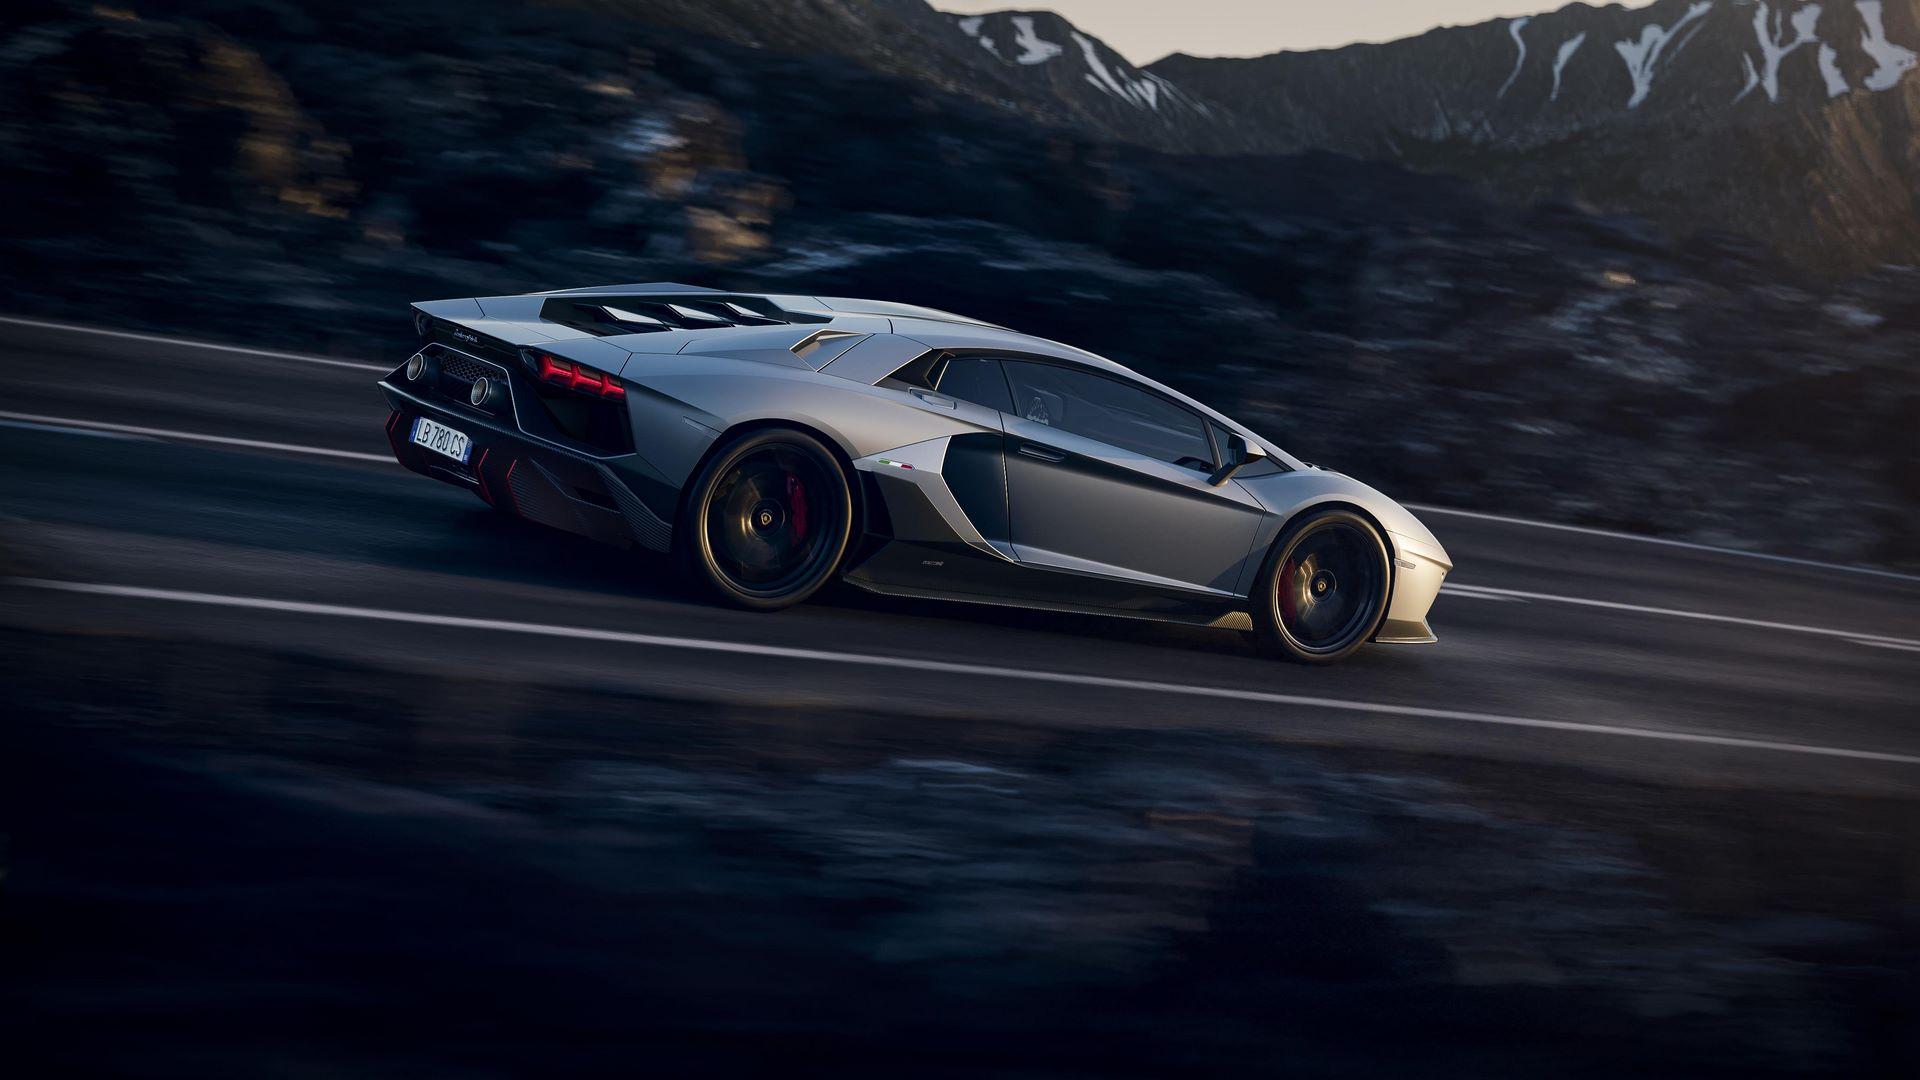 Lamborghini-Aventador-LP780-4-Ultimae-6